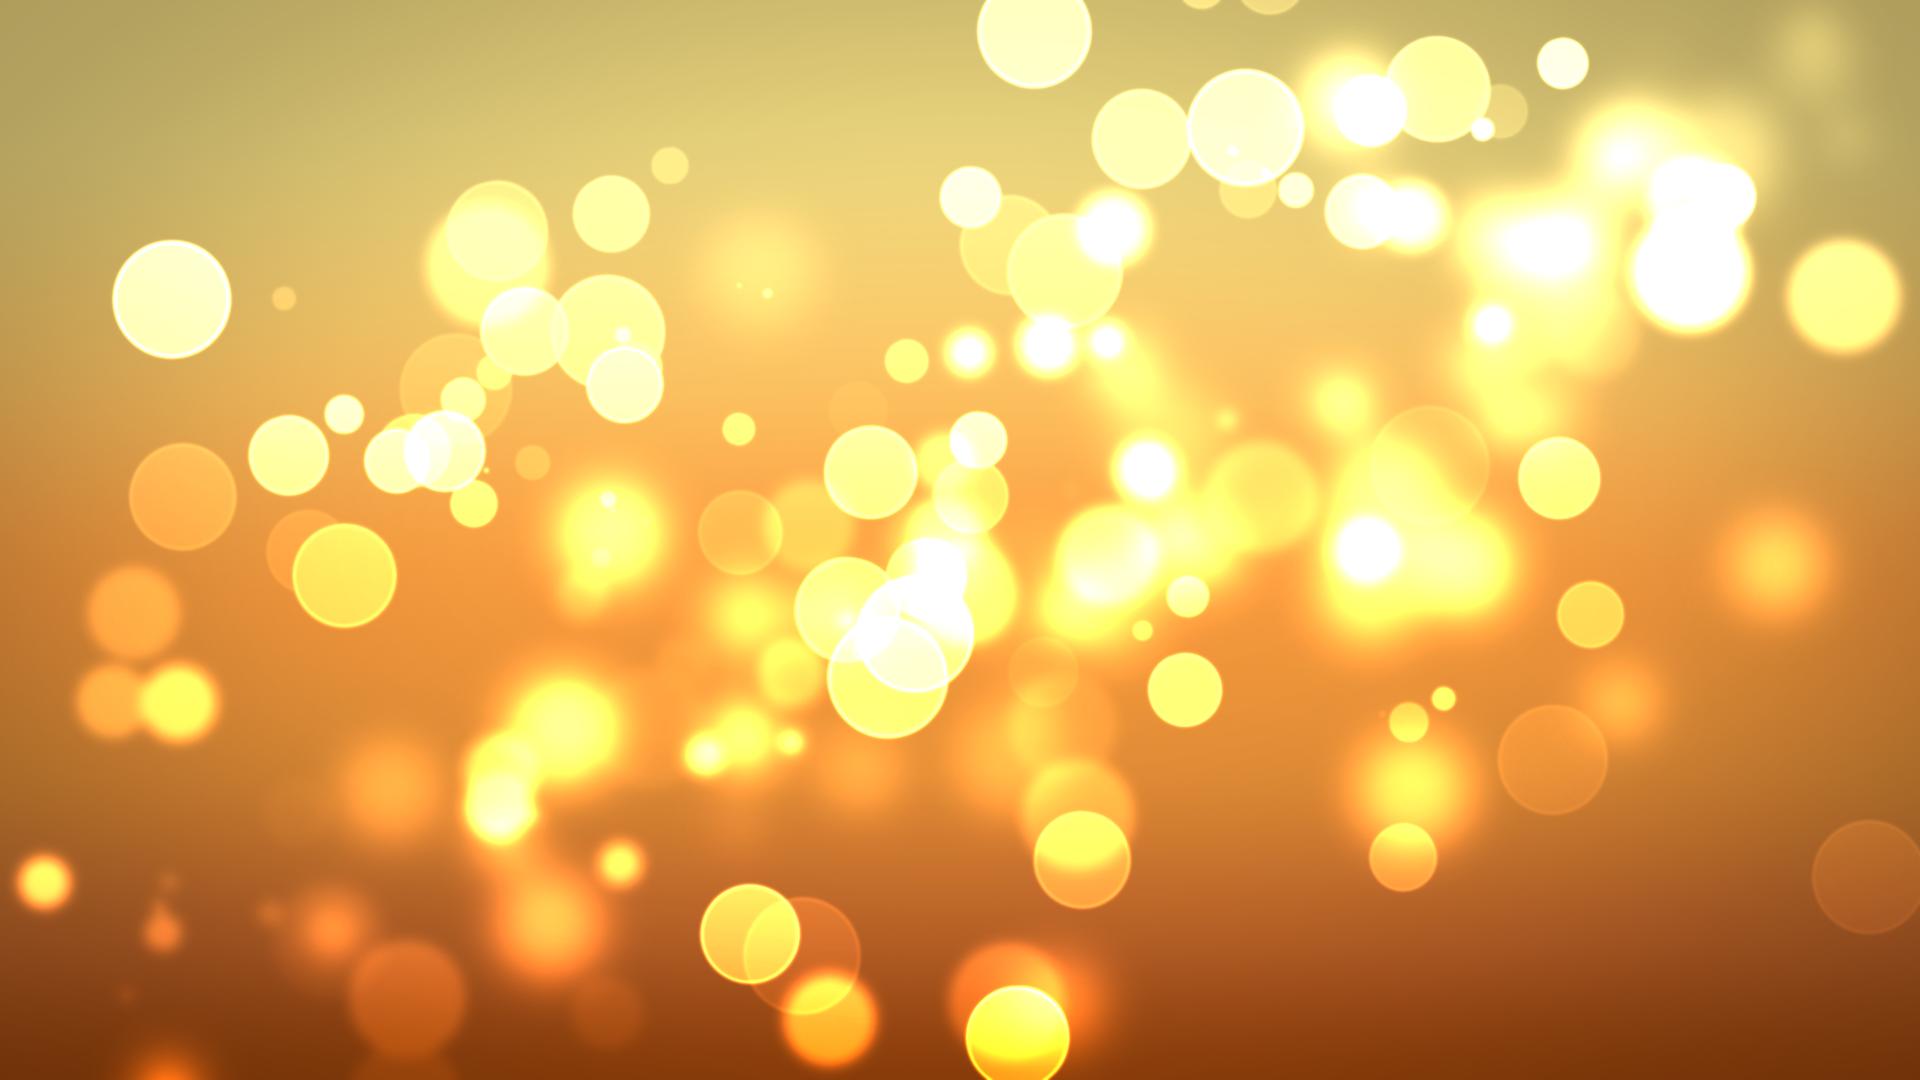 Gold Light Wallpaper